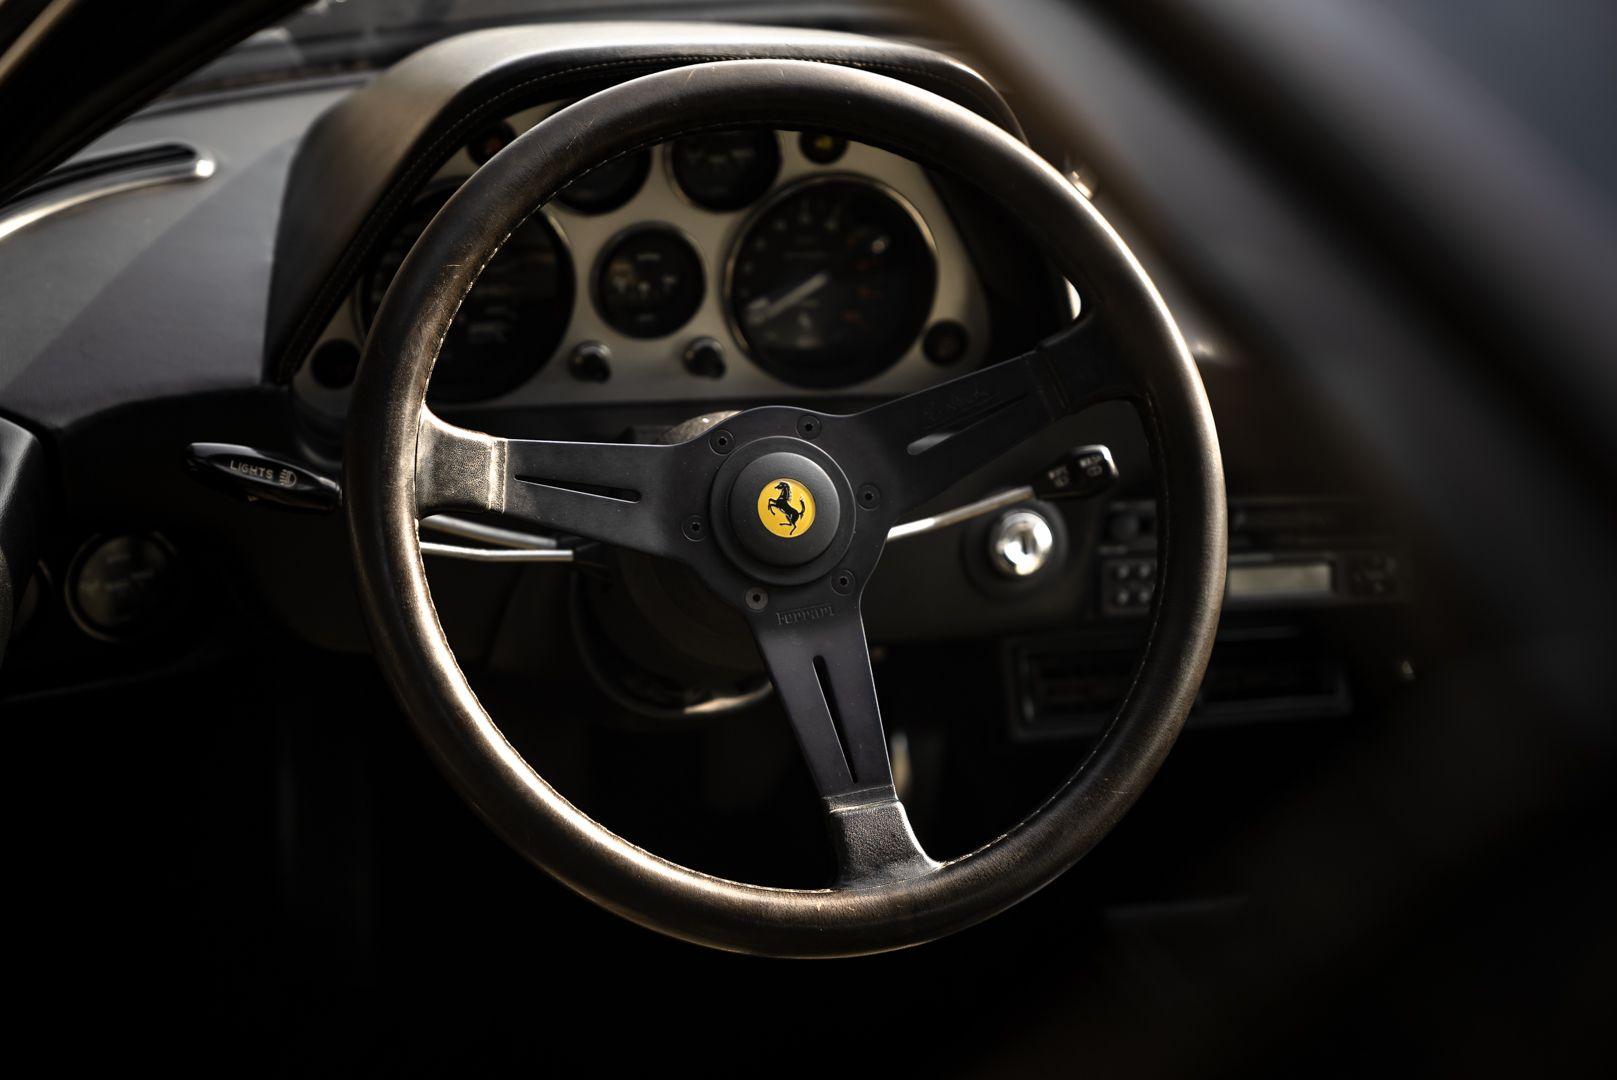 1980 Ferrari 208 GTB Carburatori 81293